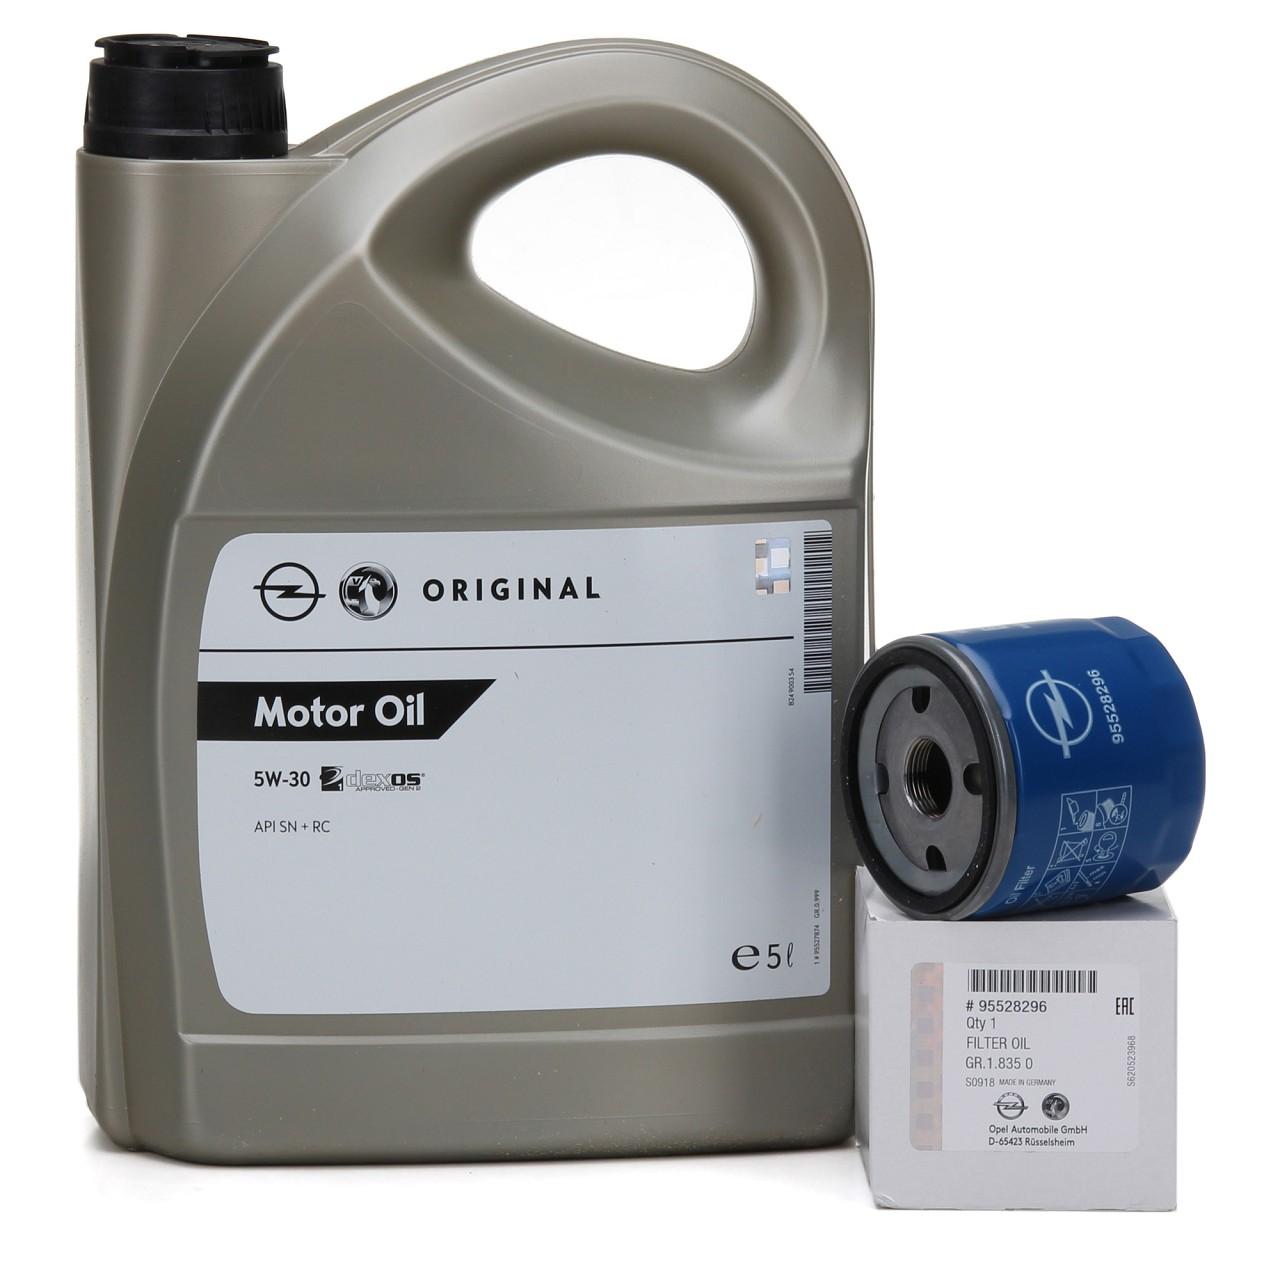 ORIGINAL Opel Motoröl 5W30 DEXOS1 Gen2 LONGLIFE 5L 95527874 + Ölfilter 95528296